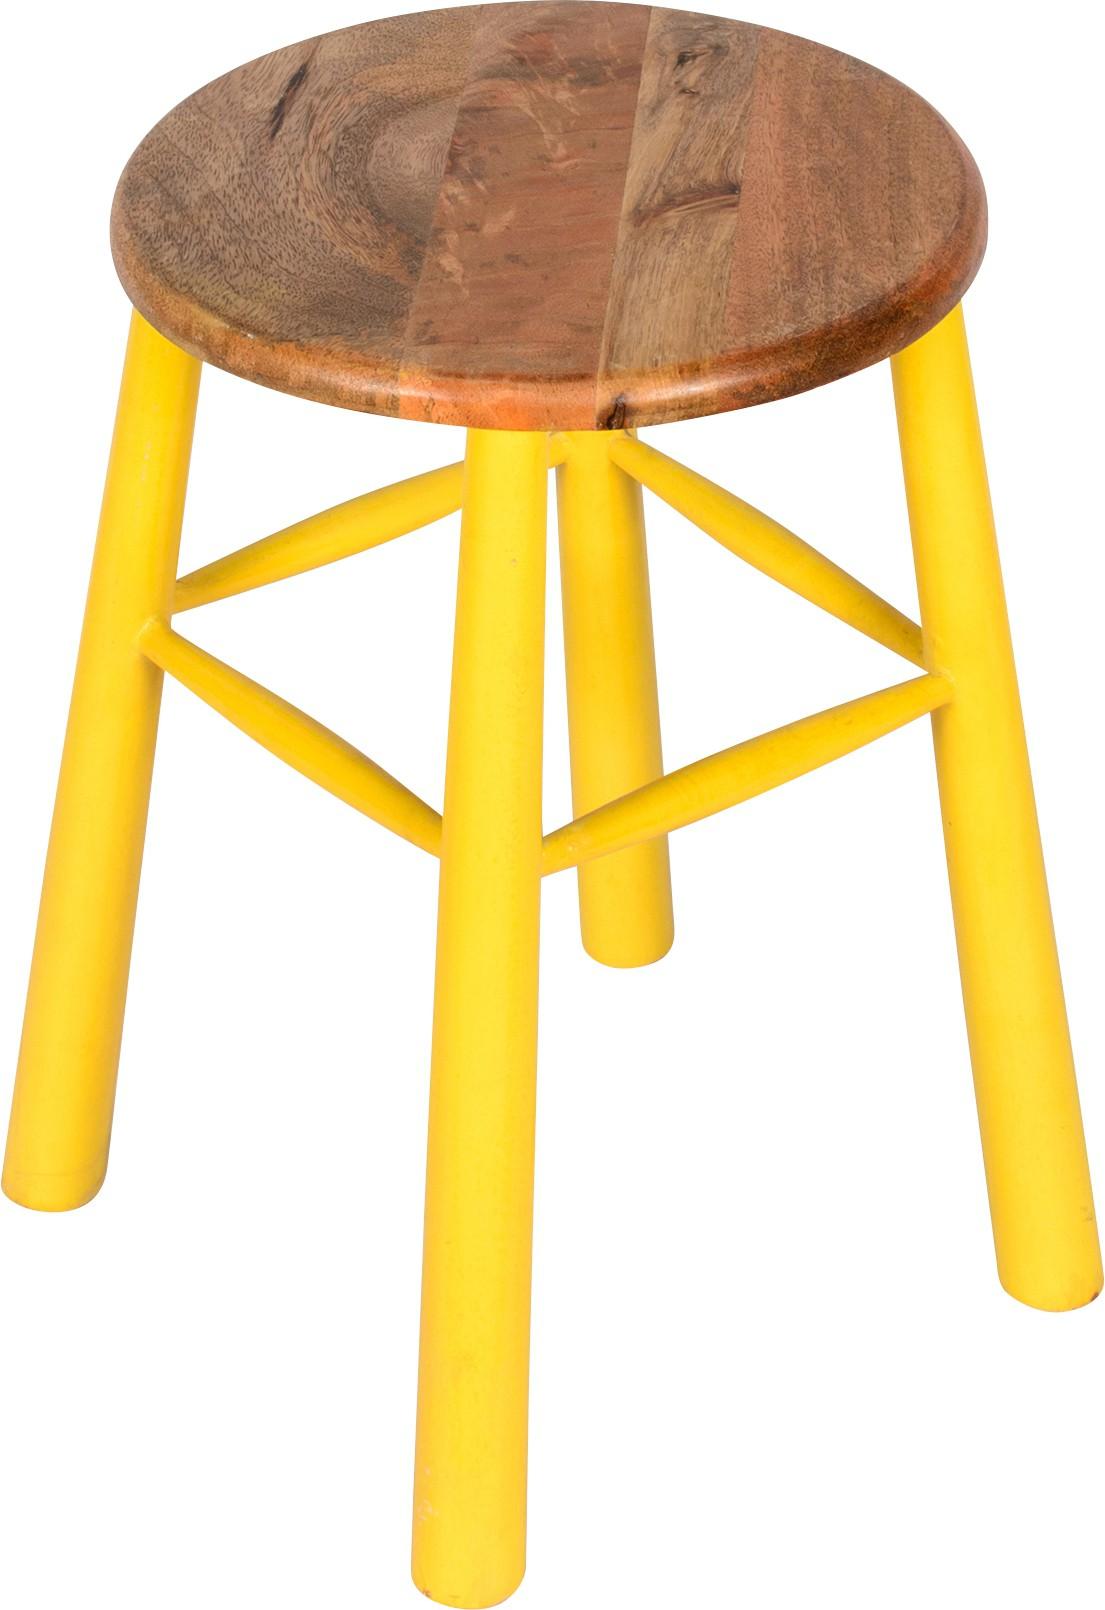 View Hastkala Solid Wood Stool(Finish Color - Yellow) Furniture (Hastkala)